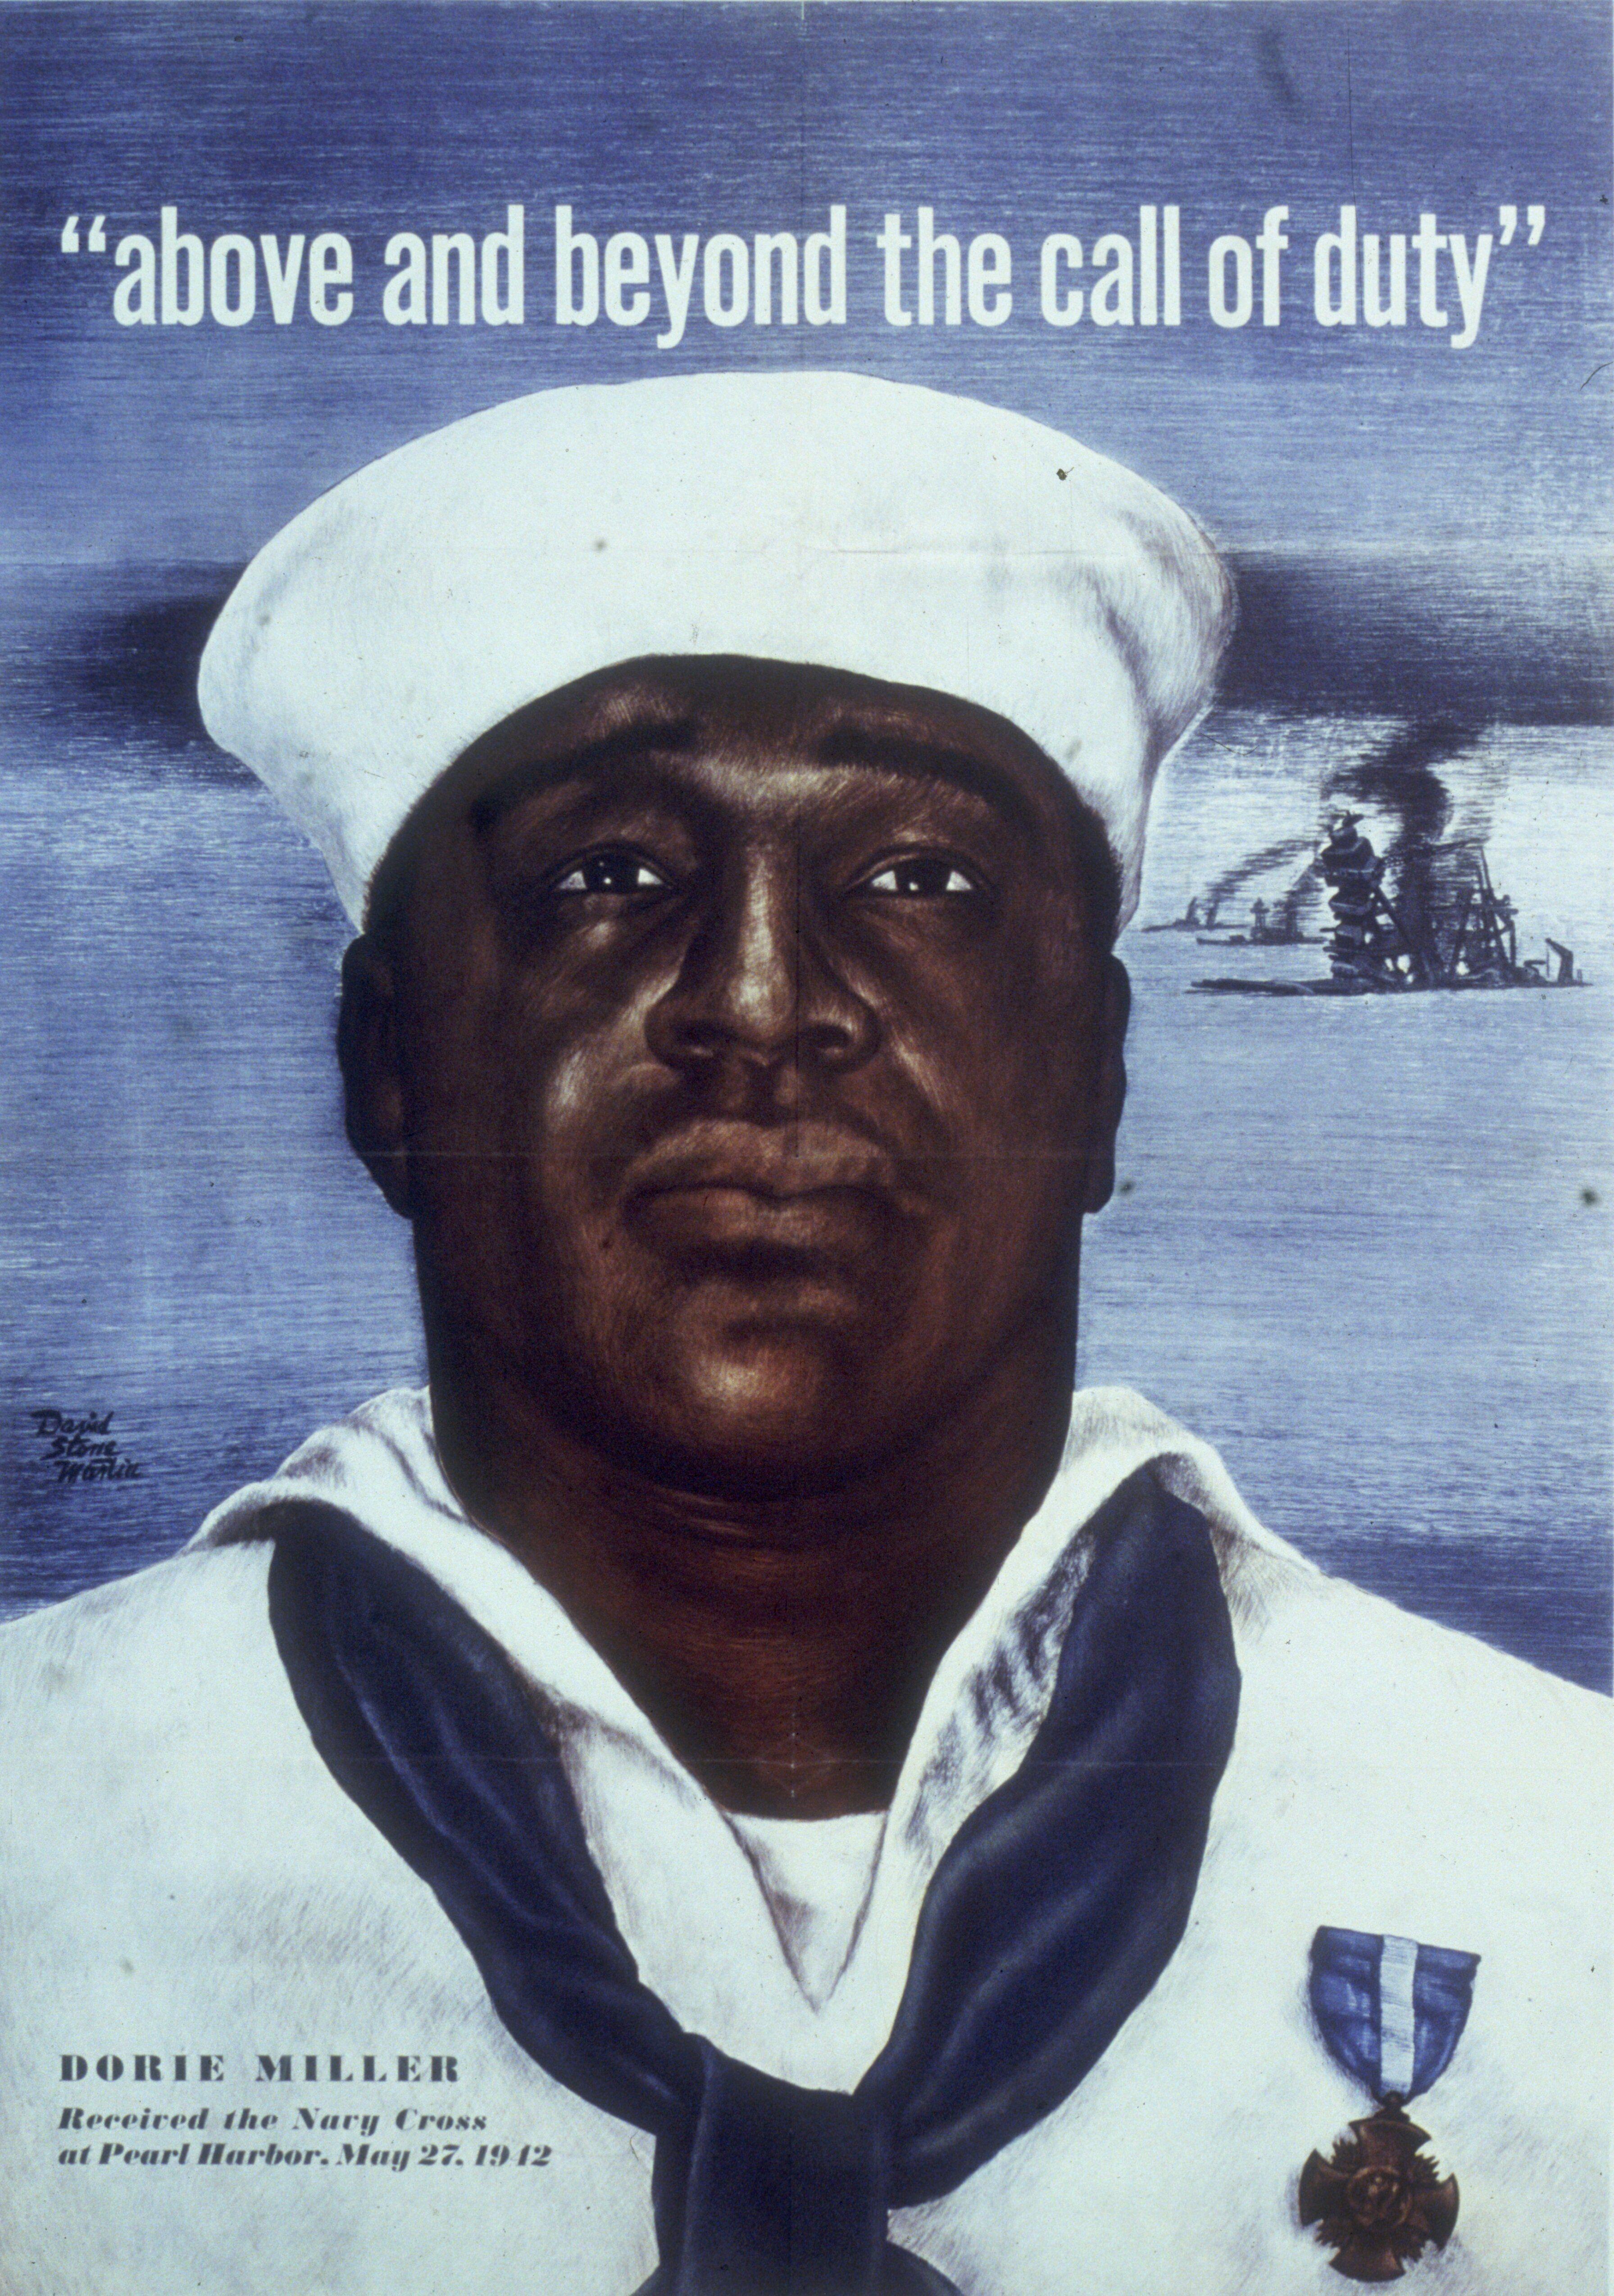 Circa 1942: Headshot portrait of Naval Mess Attendant 3rd Class Doris Miller, wearing a Navy Cross pinned to his sailor's uni